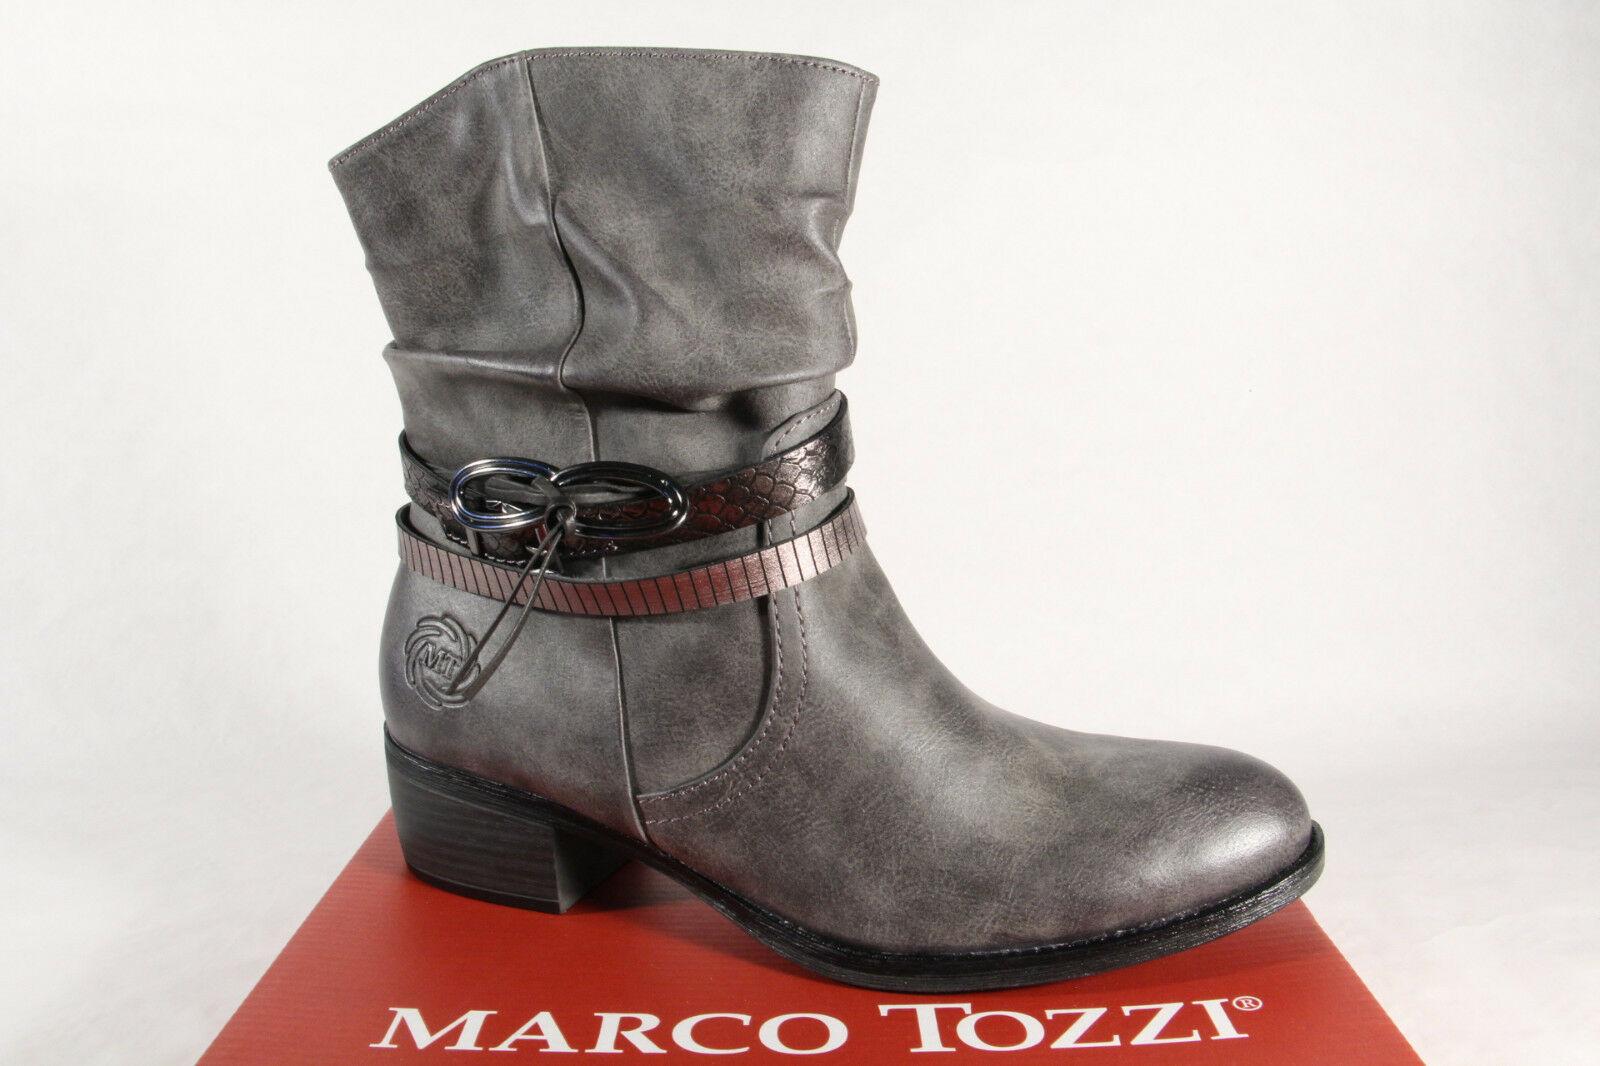 Marco Tozzi Damen Stiefel Stiefeletten Schnürstiefel, Stiefel grau 25316 NEU